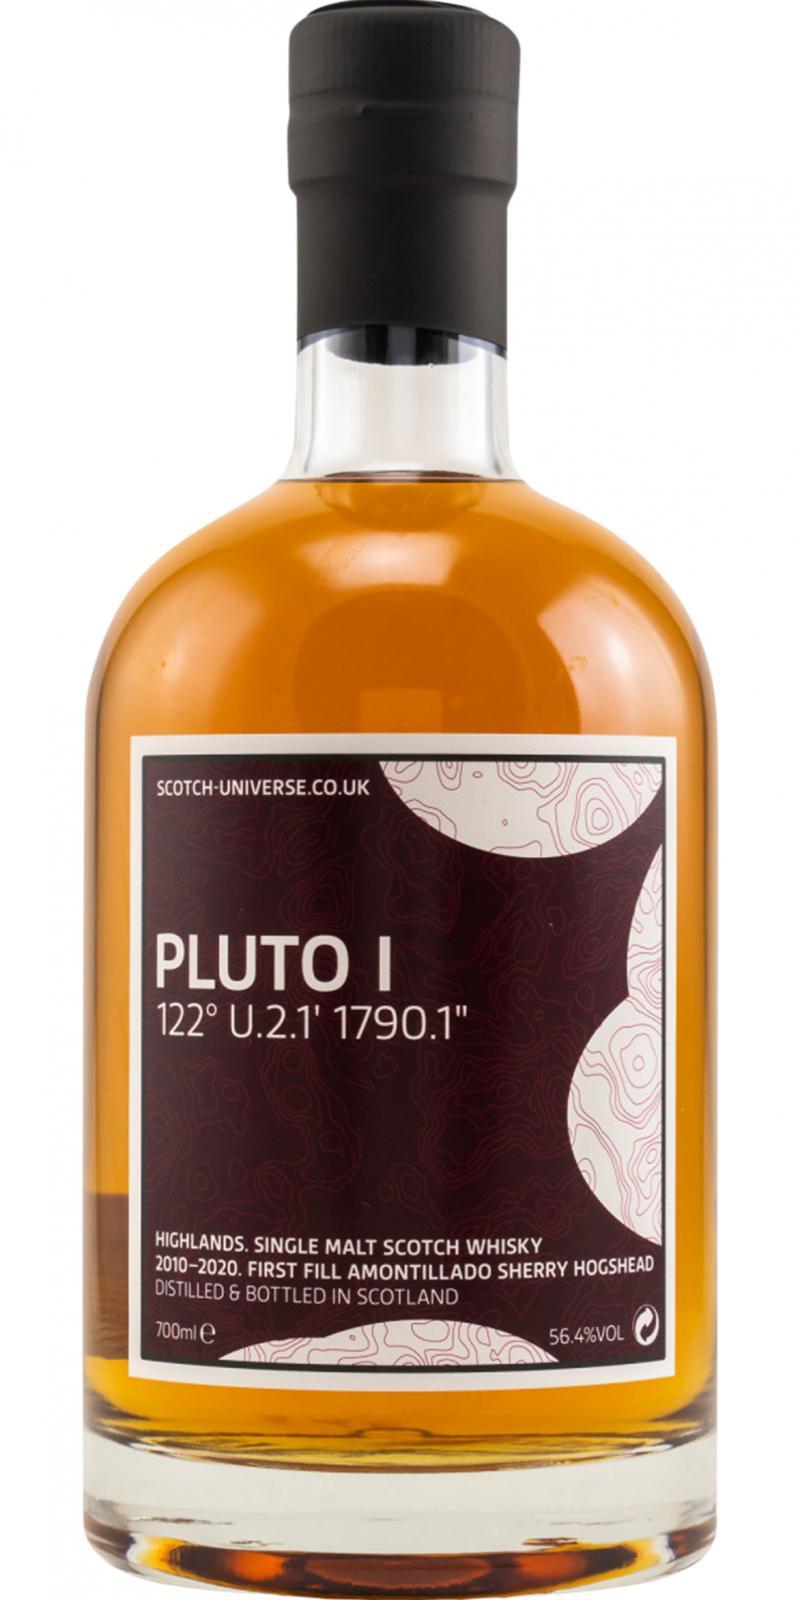 "Scotch Universe Pluto I - 122° U.2.1' 1790.1"""